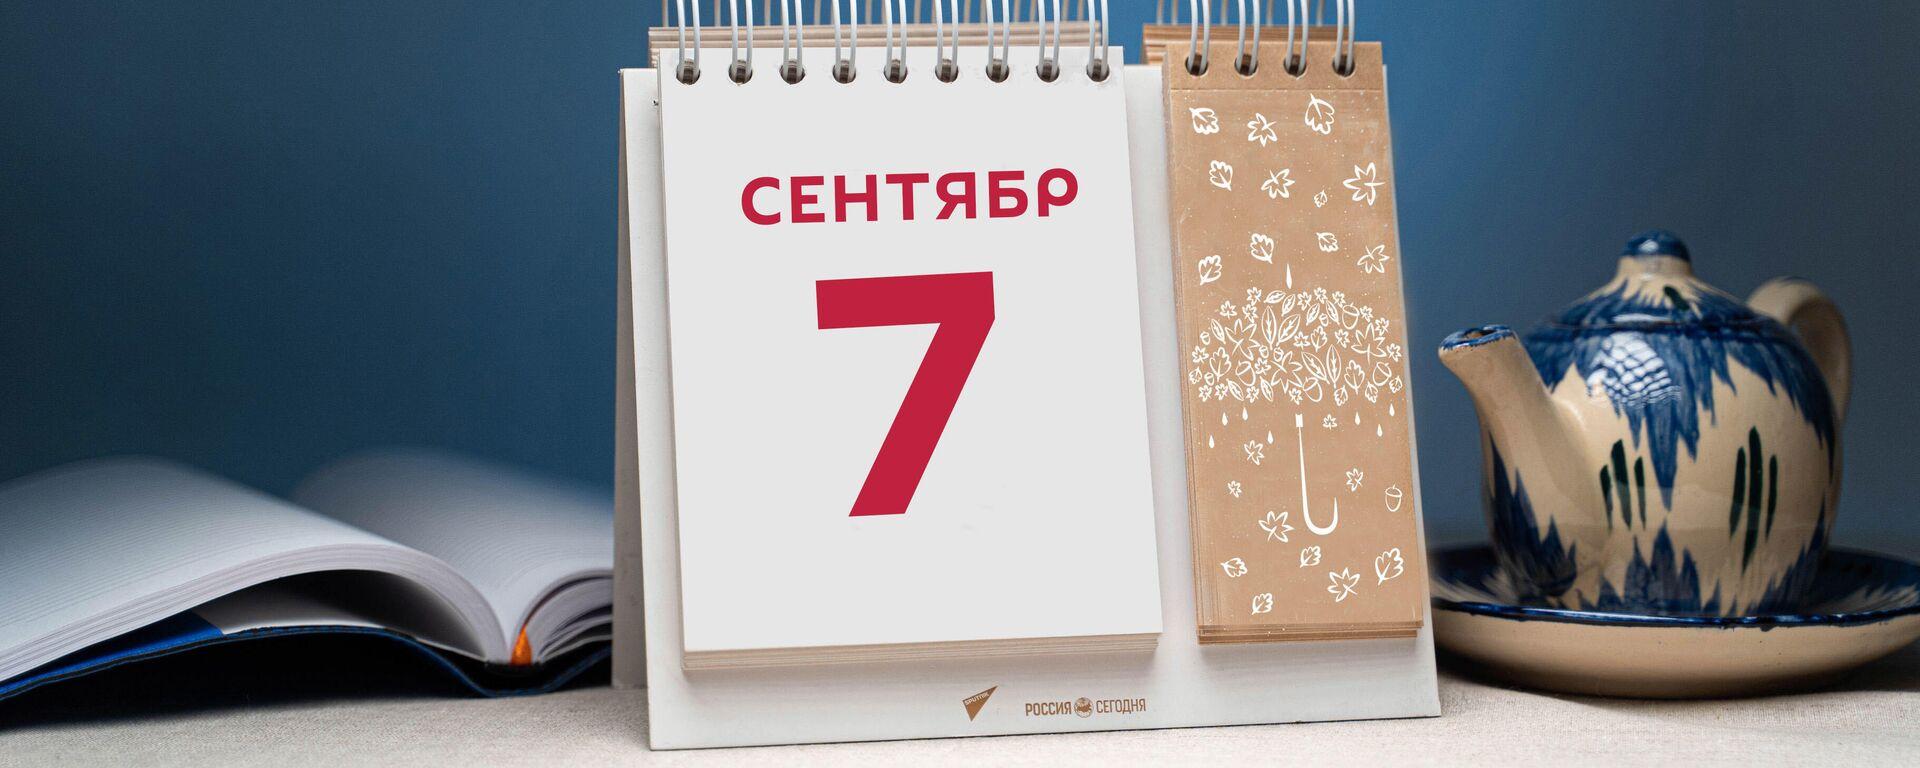 День 7 сентября - Sputnik Тоҷикистон, 1920, 07.09.2021